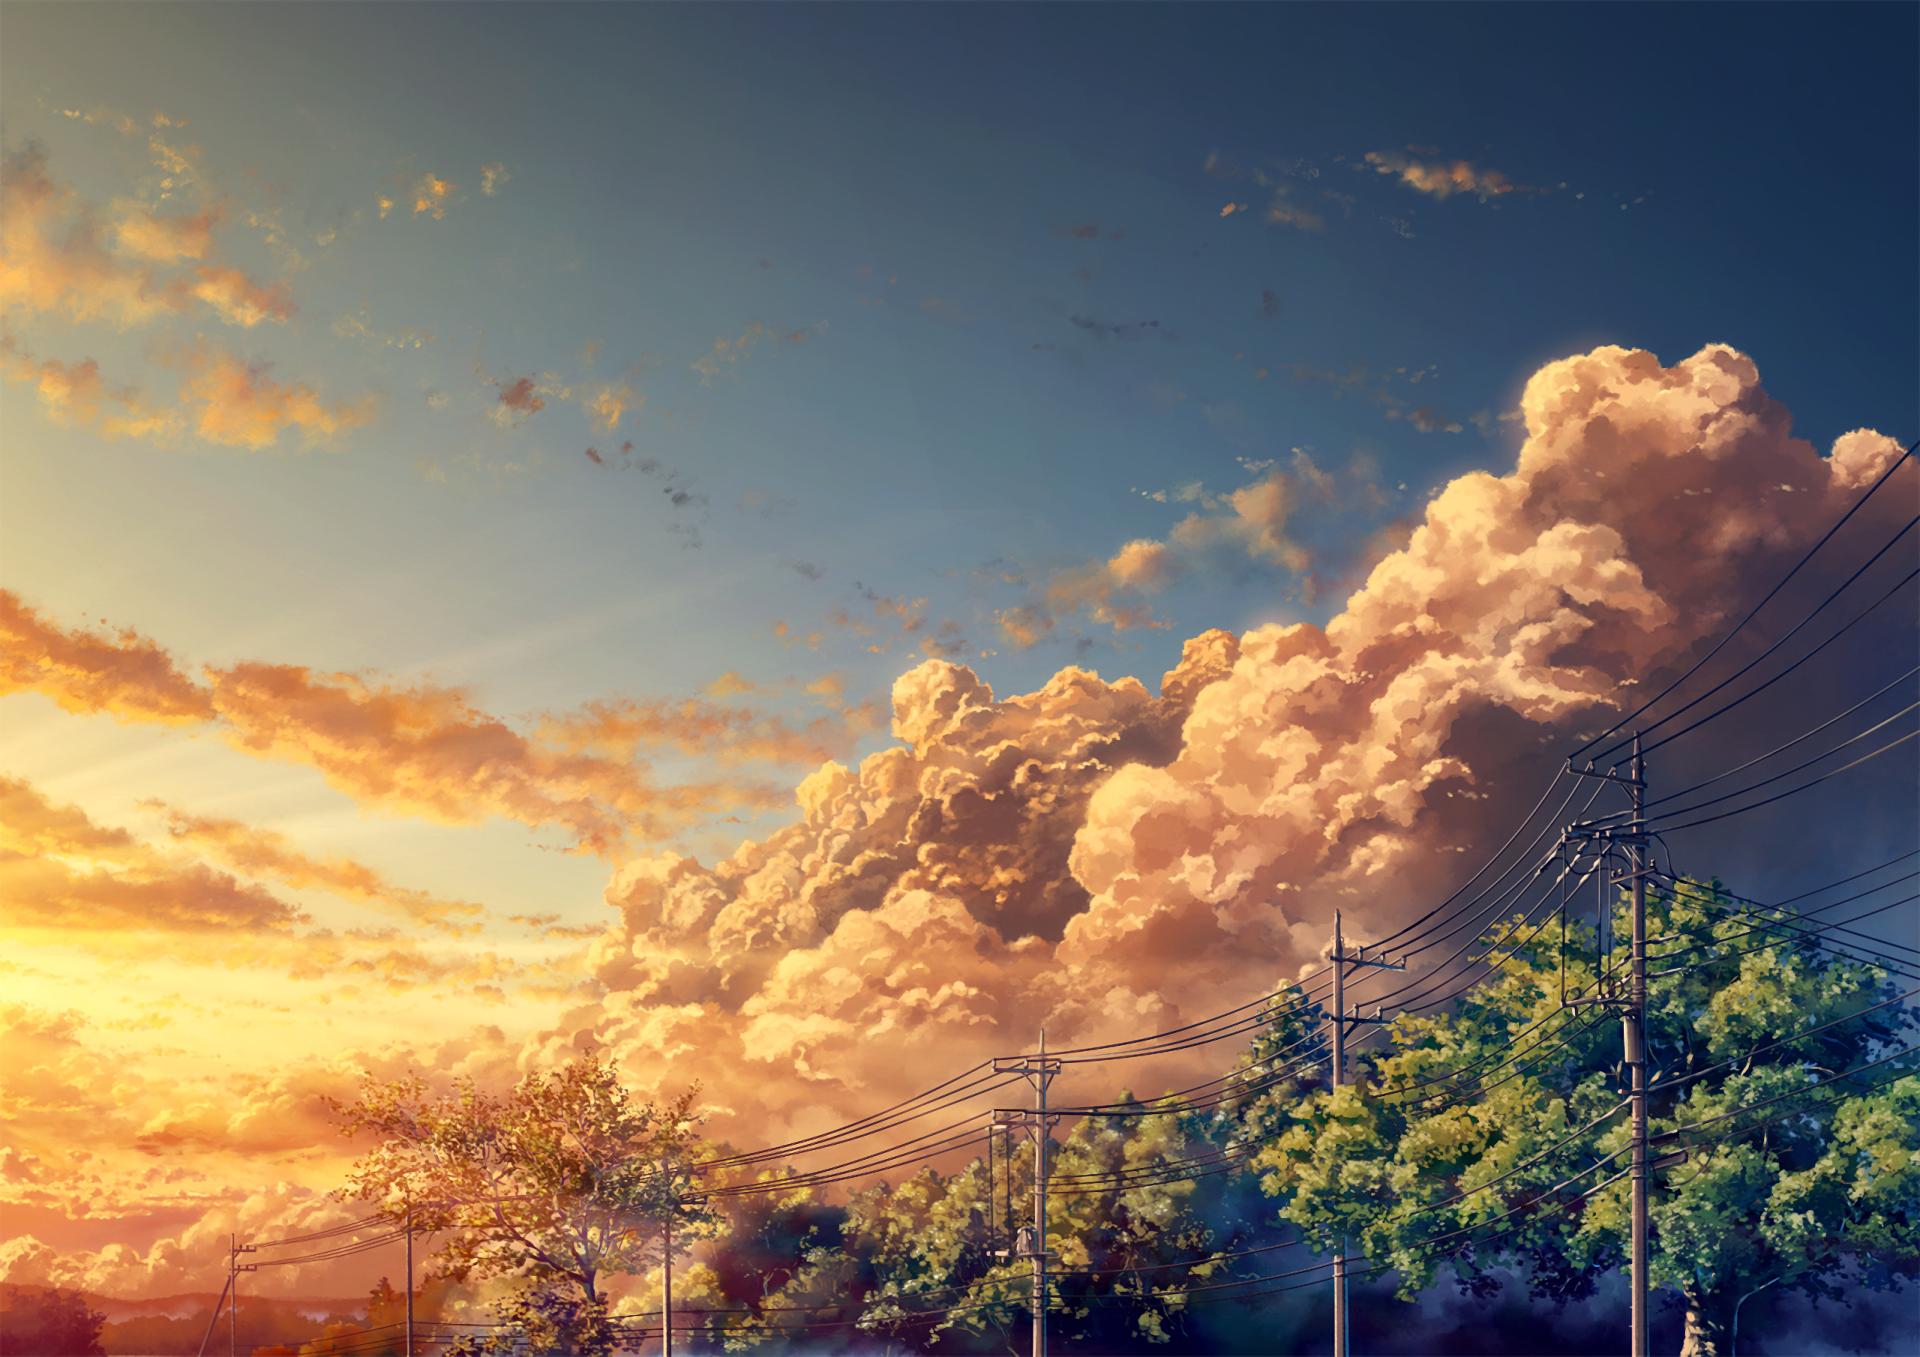 Original Wallpaper Background Image Anime If You Enjoy Pls Follow Me Thanks 3 Anime Scenery Anime Scenery Wallpaper Scenery Wallpaper